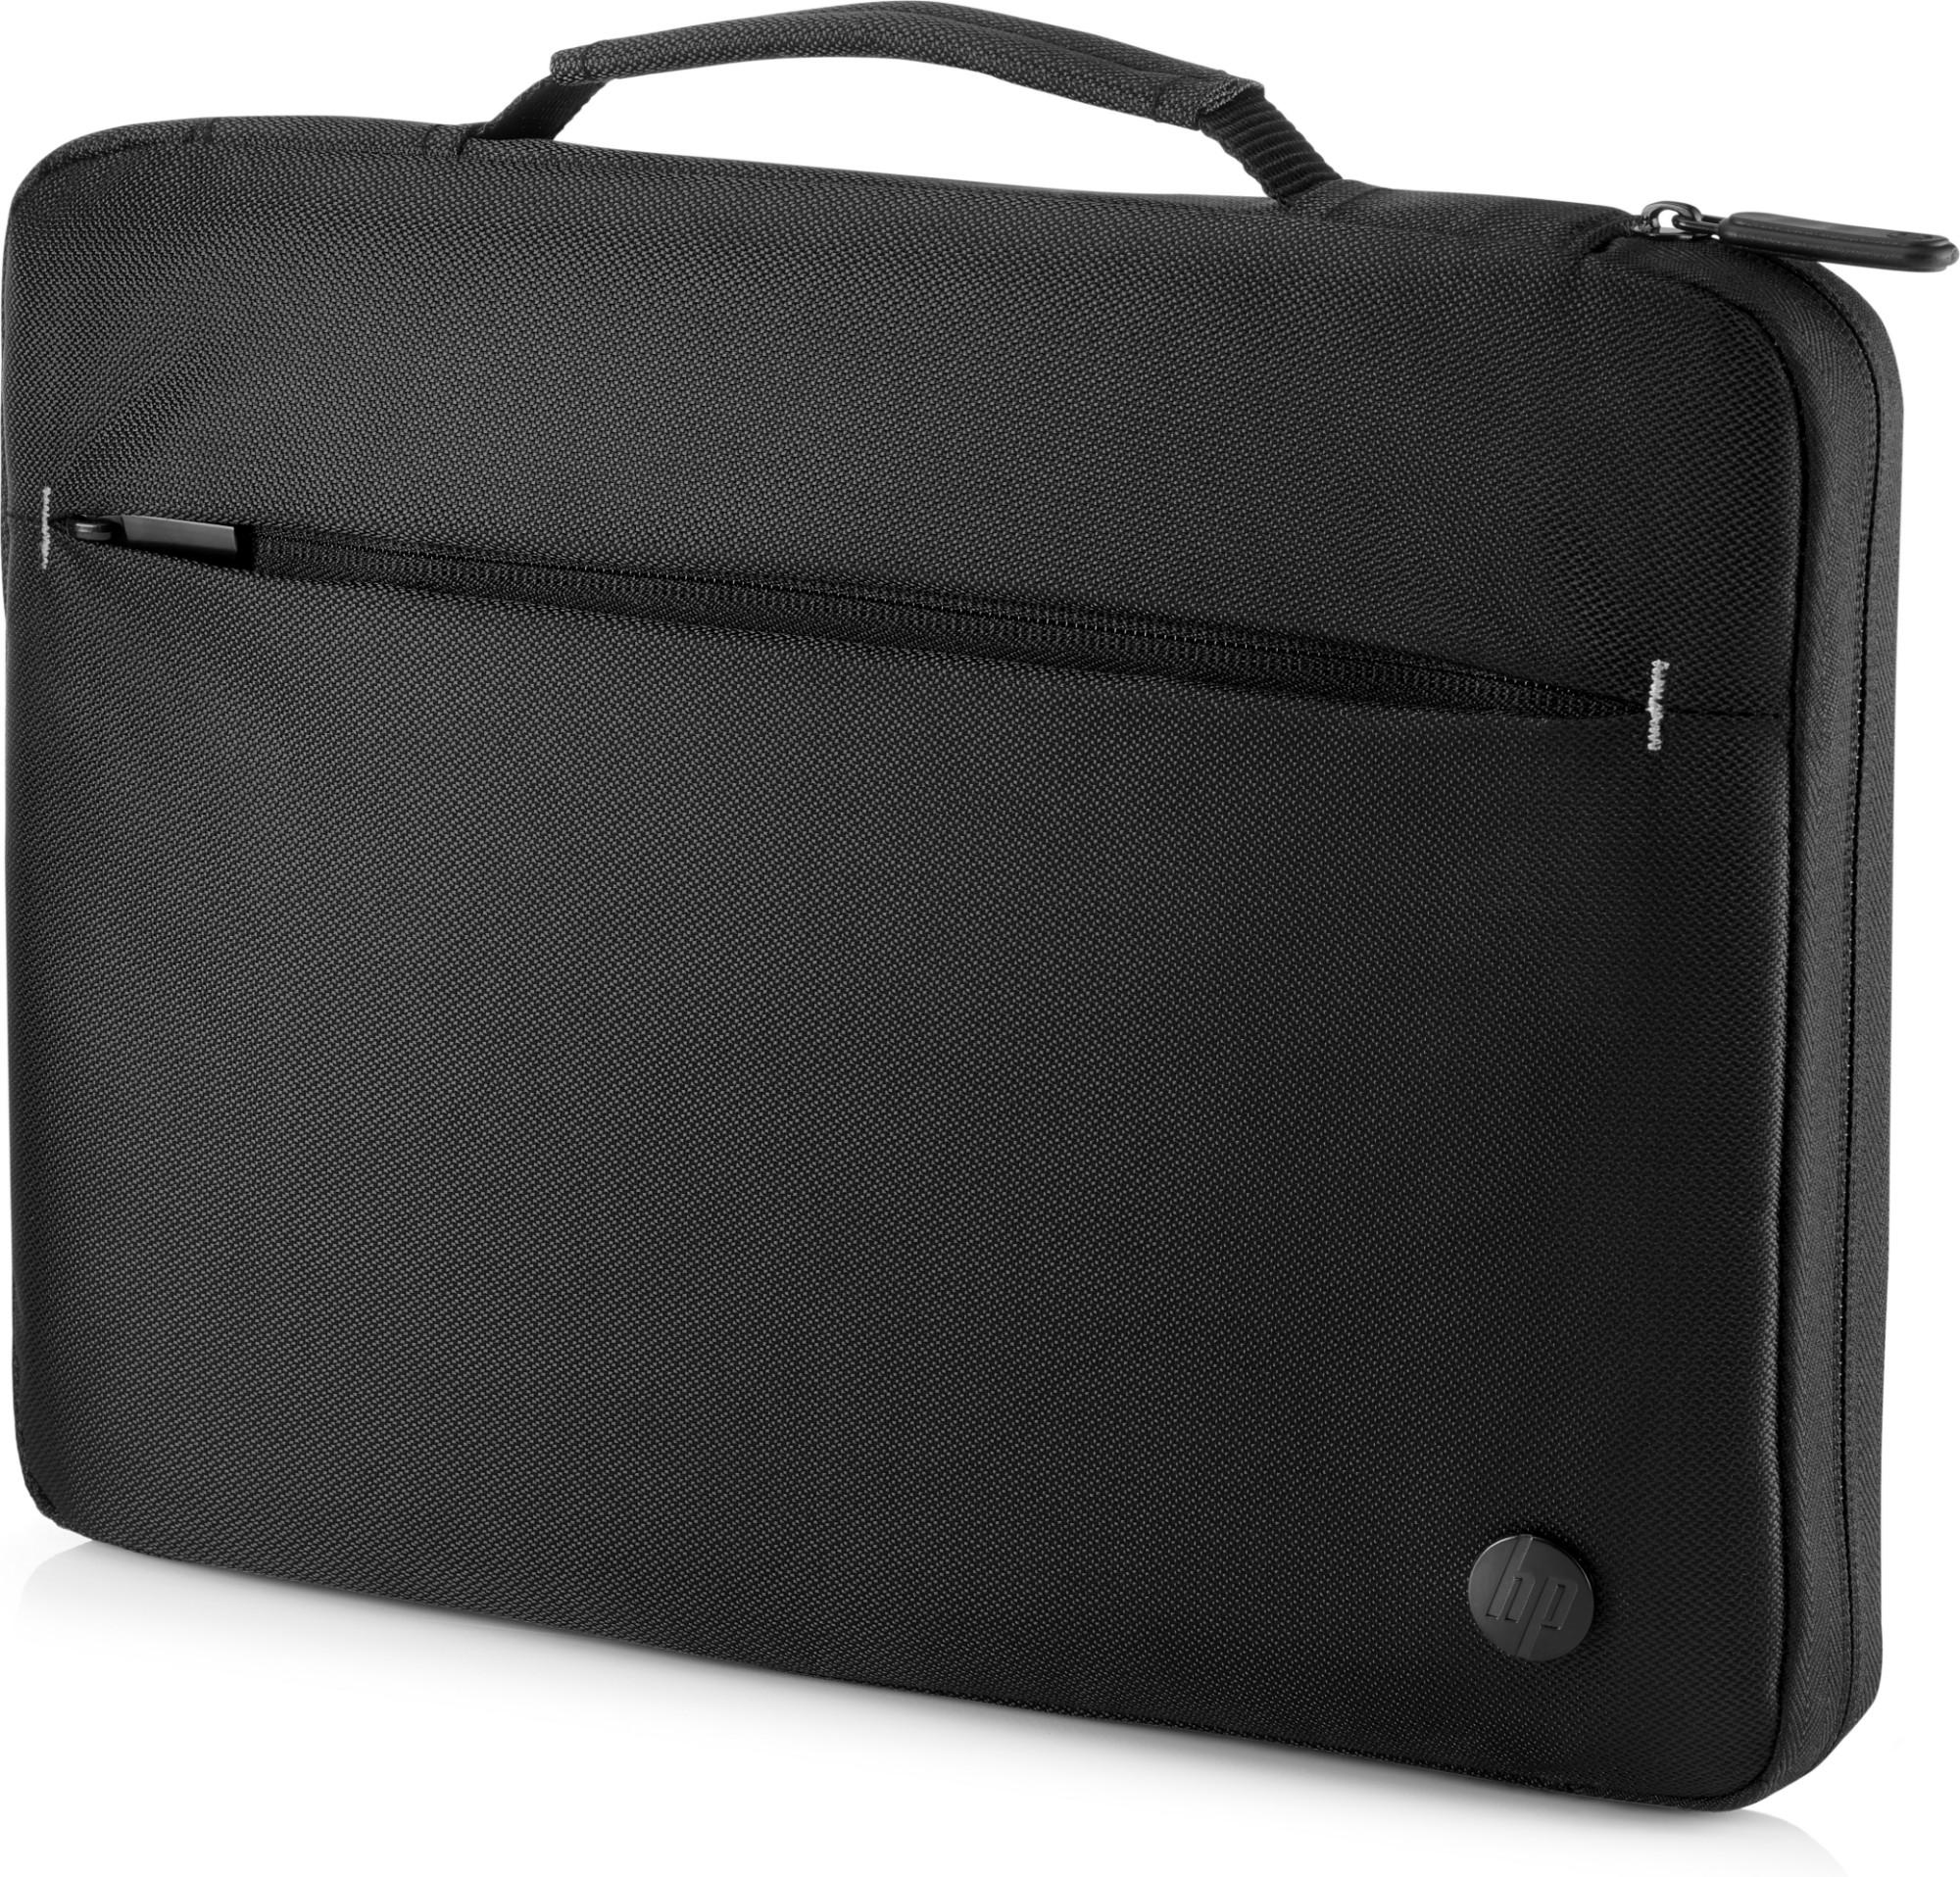 "HP 13.3 Business Sleeve 33.8 cm (13.3"") Sleeve case Black"